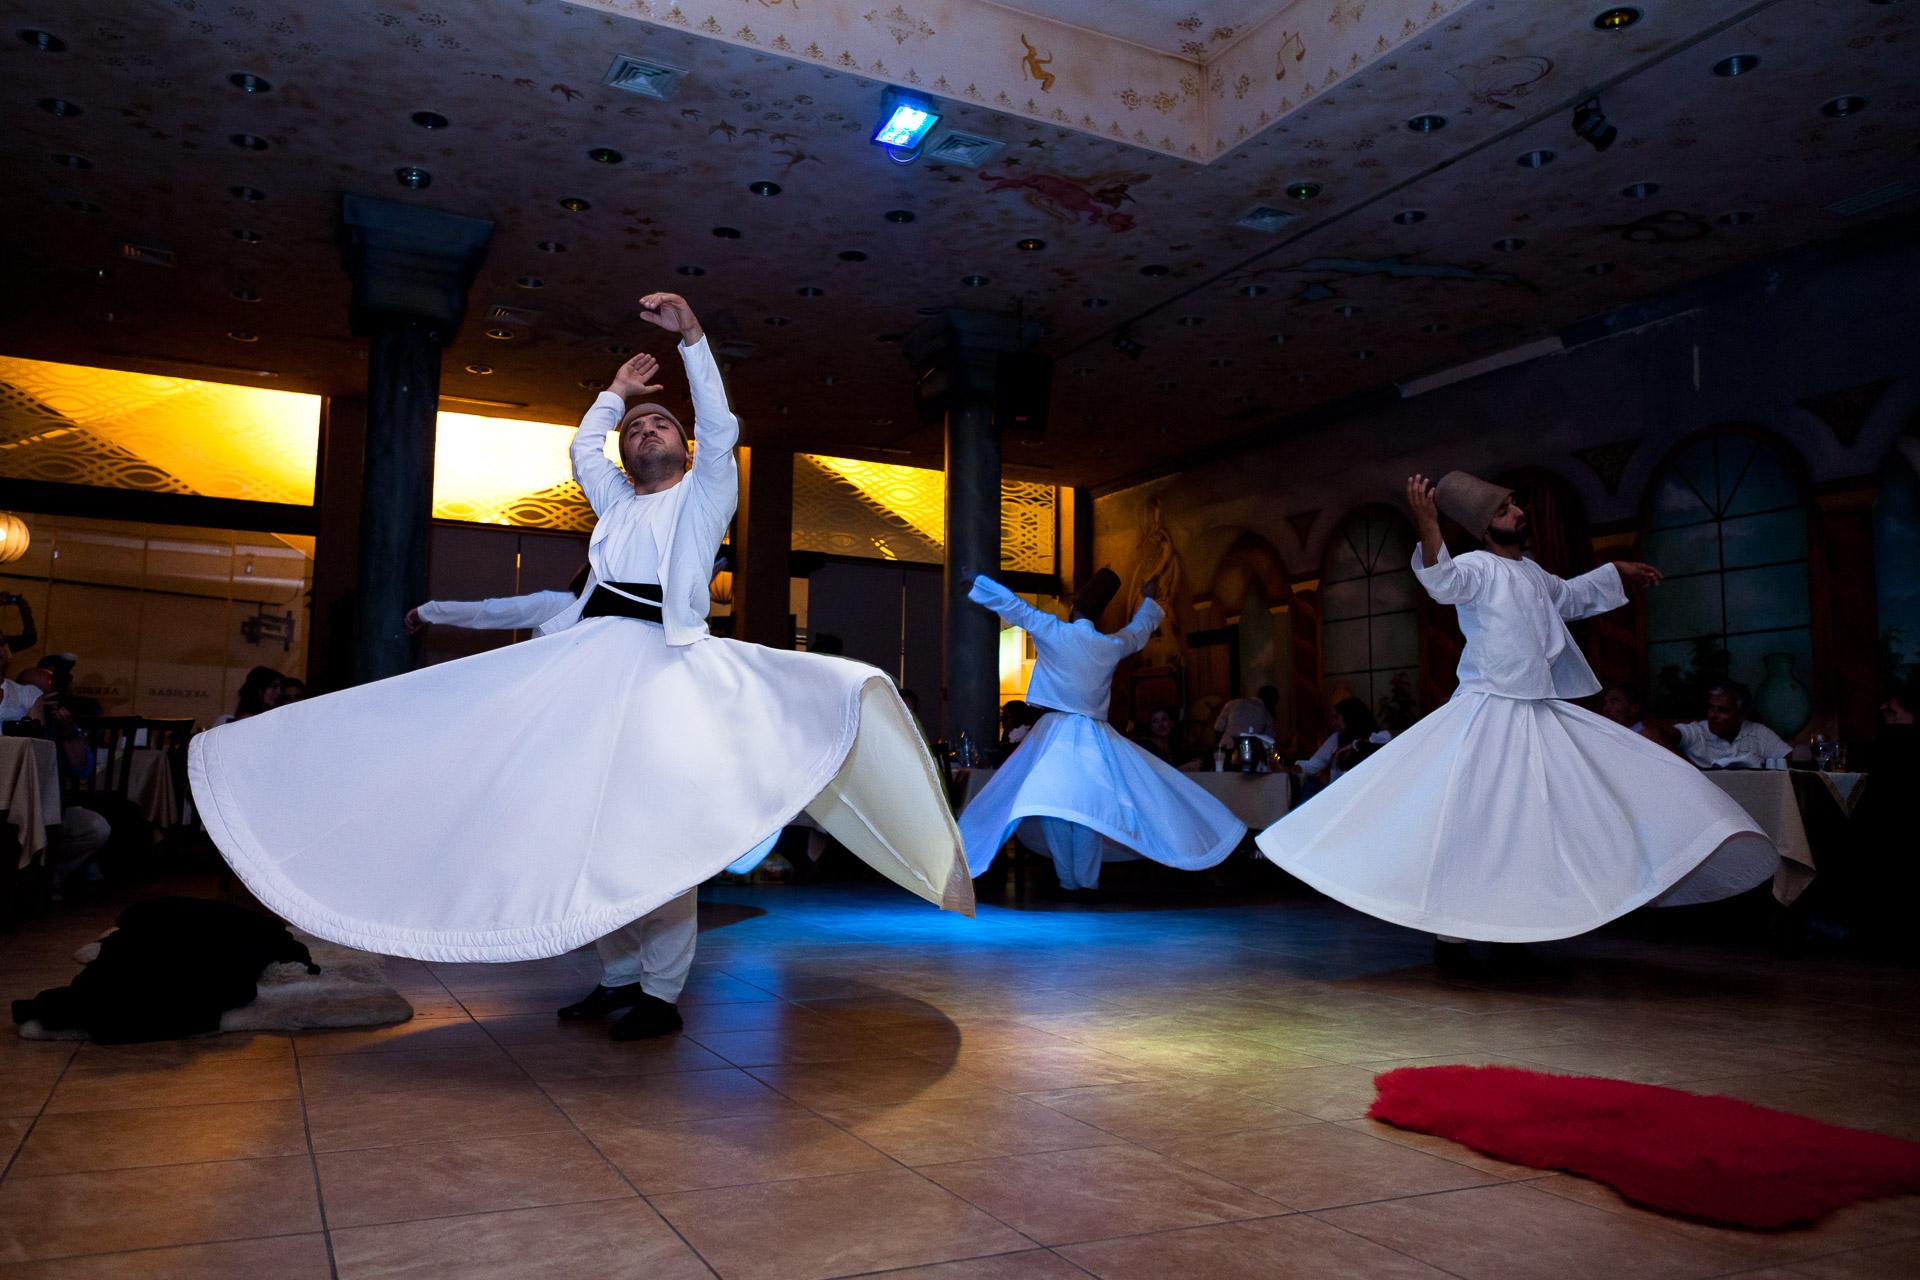 Turkish dancers in an indoor setting